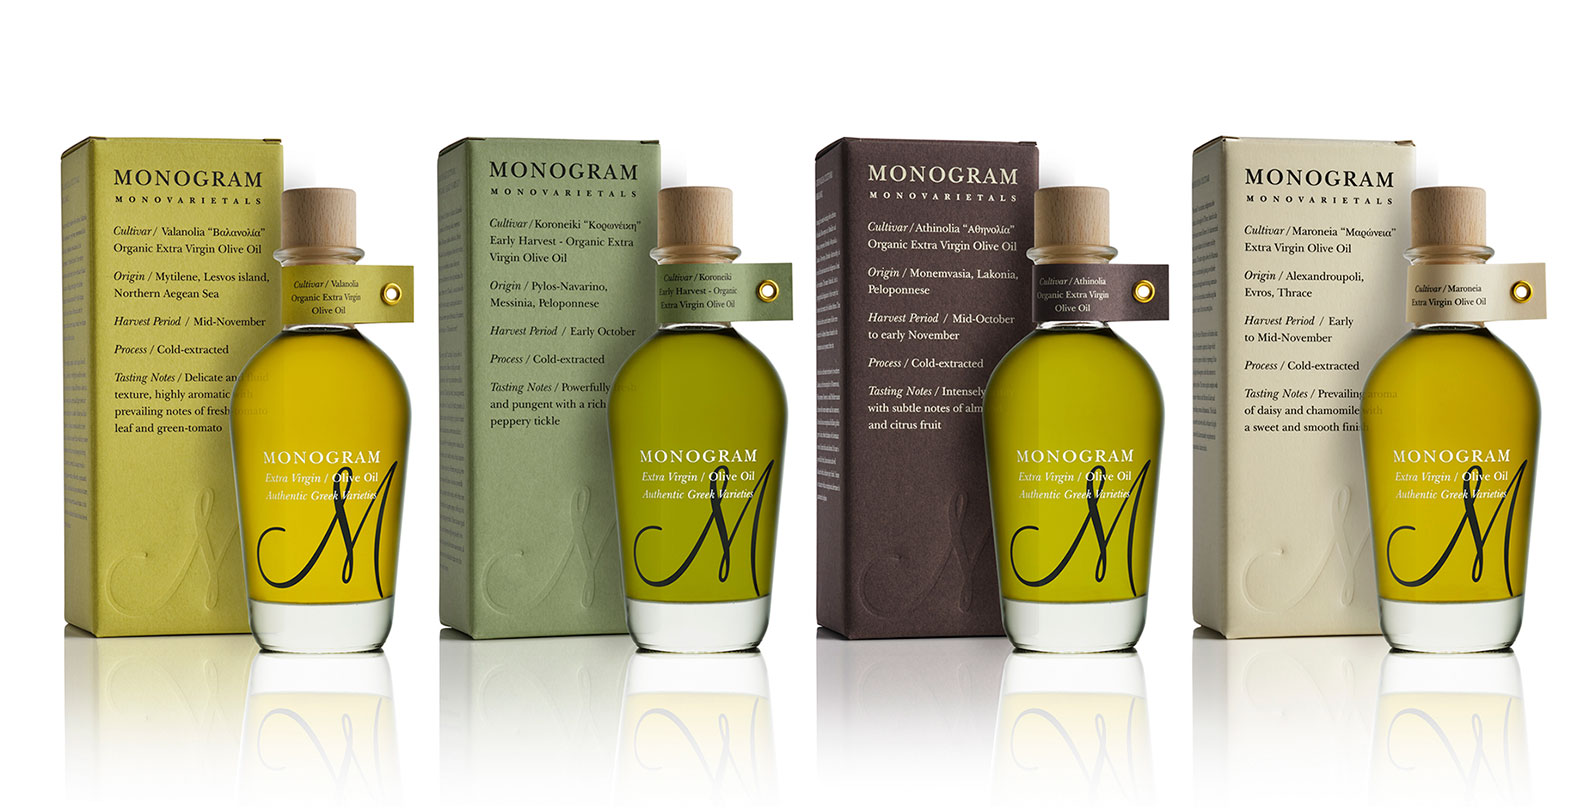 Monogram-Monovarietals-Family